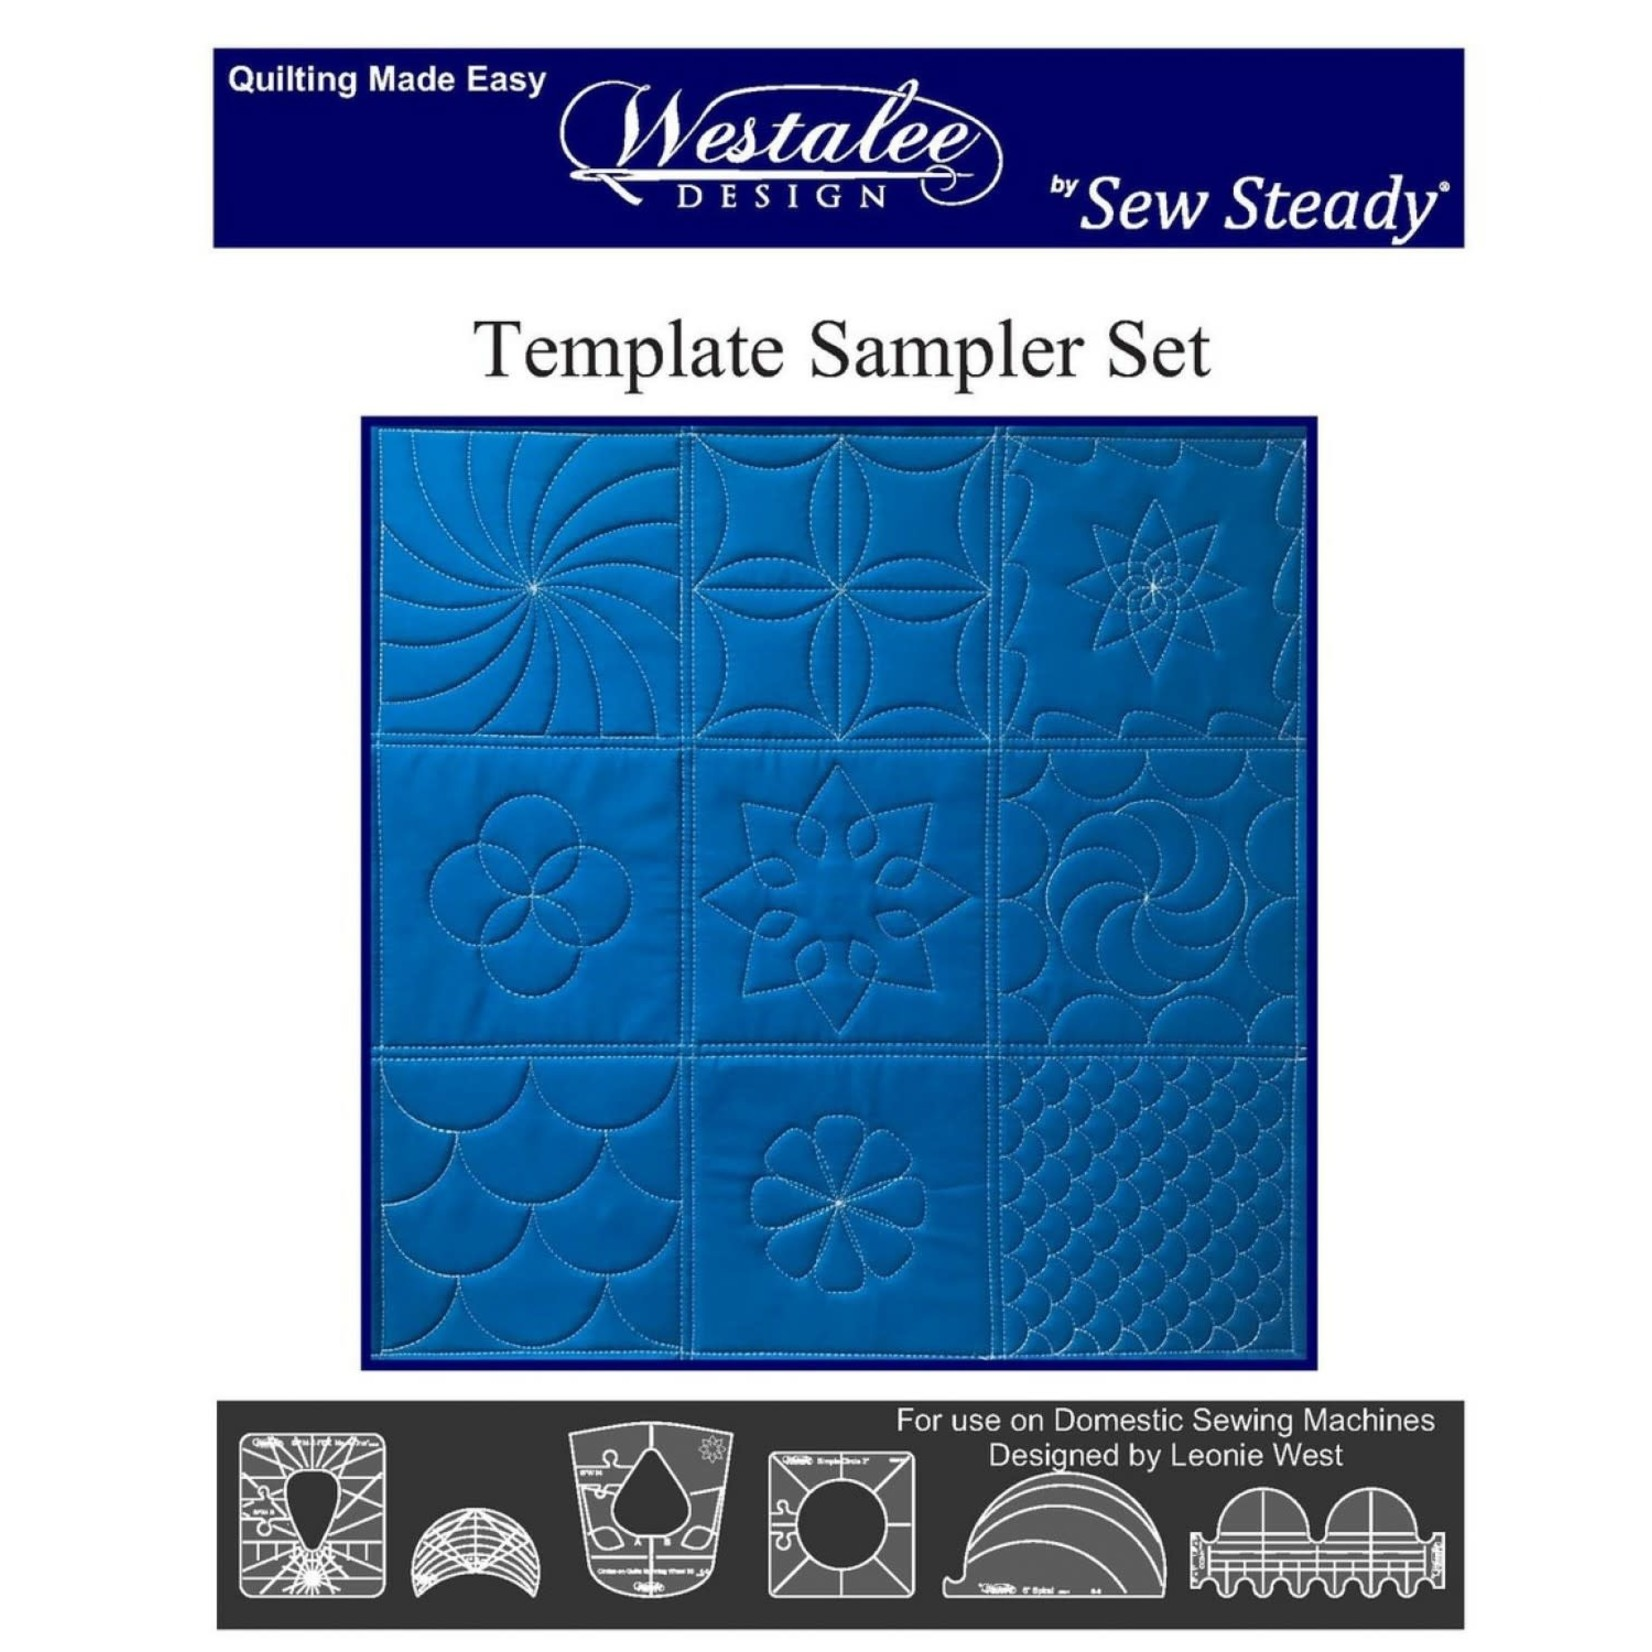 Sew Steady Quiltliniaal - Template Sampler Set - Low Shank